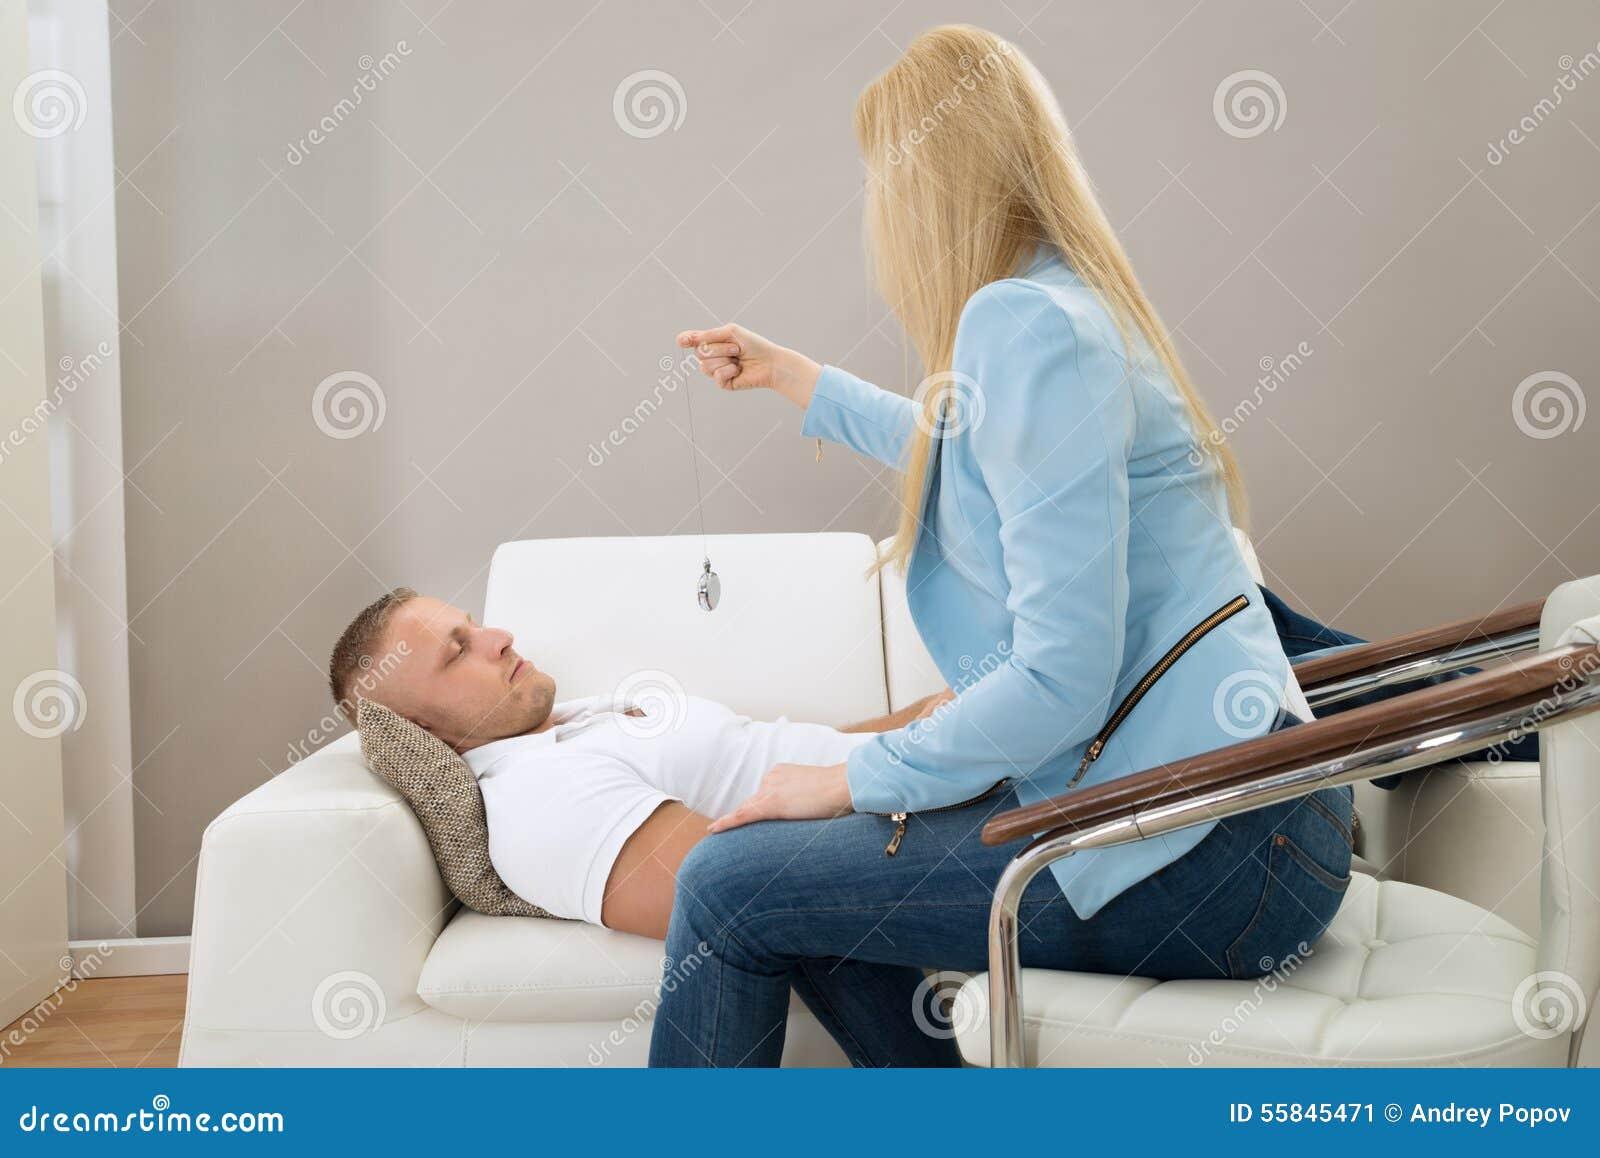 Psychiatrist Hypnotizing Patient